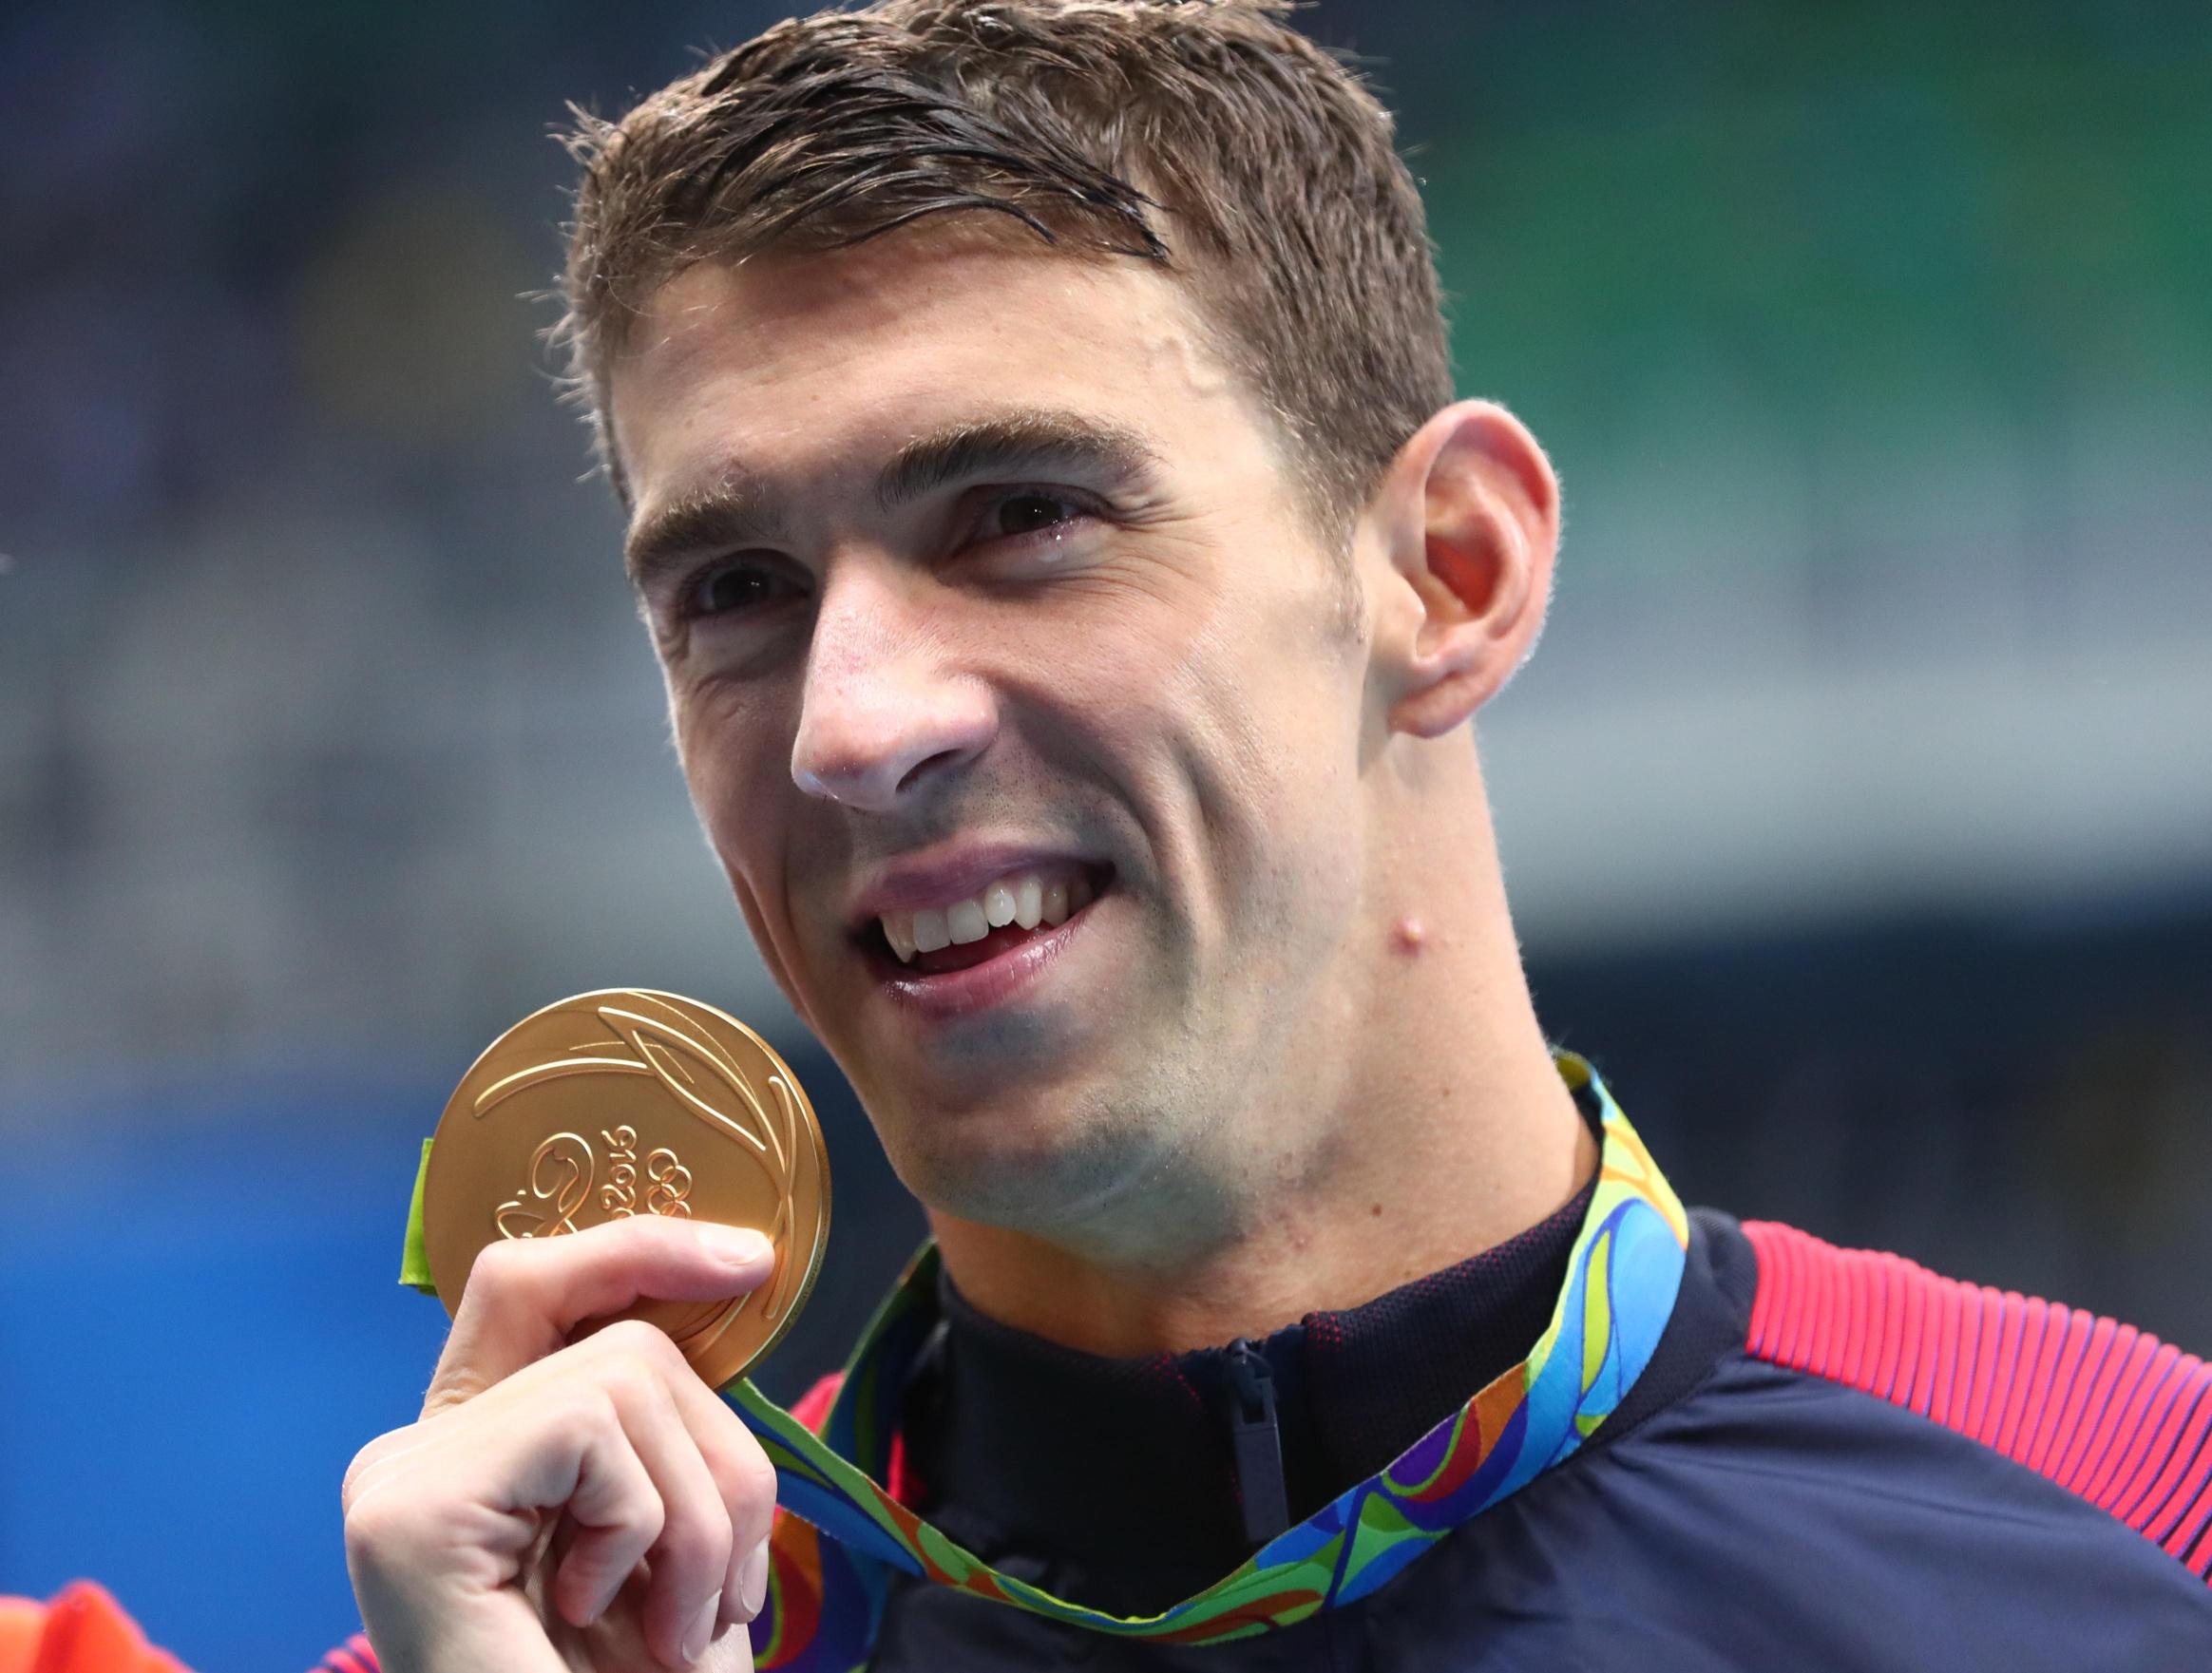 Olympians Phelps, Ledecky, Manuel & Murphy Finalists for 2017 ESPYS - Swimming World News